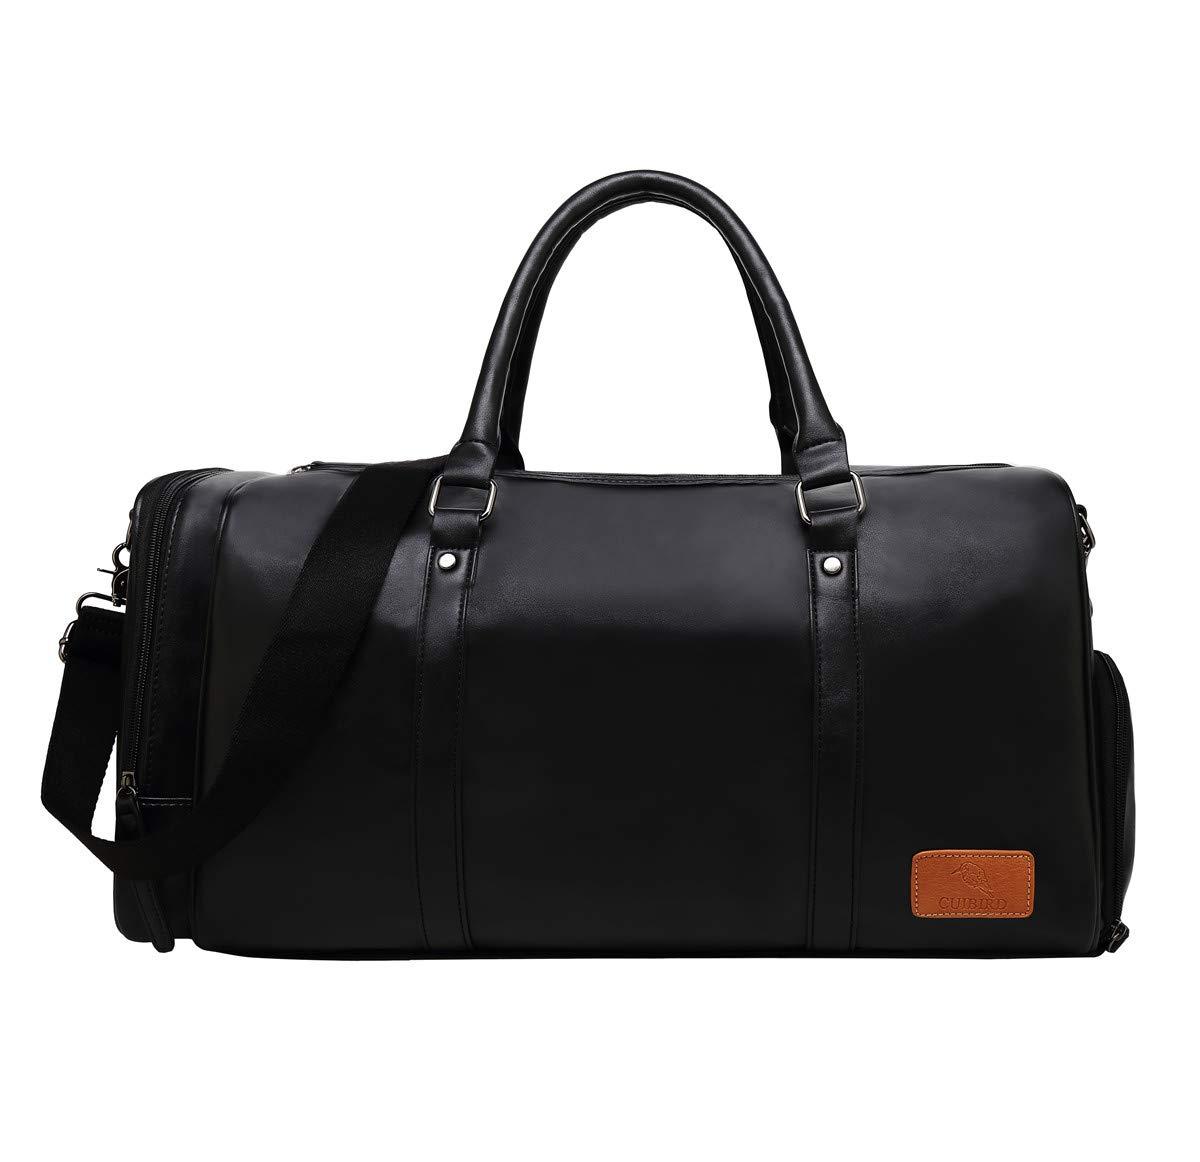 49d86c3173252 Damen Weekender Taschen online entdecken - Weekender Bag